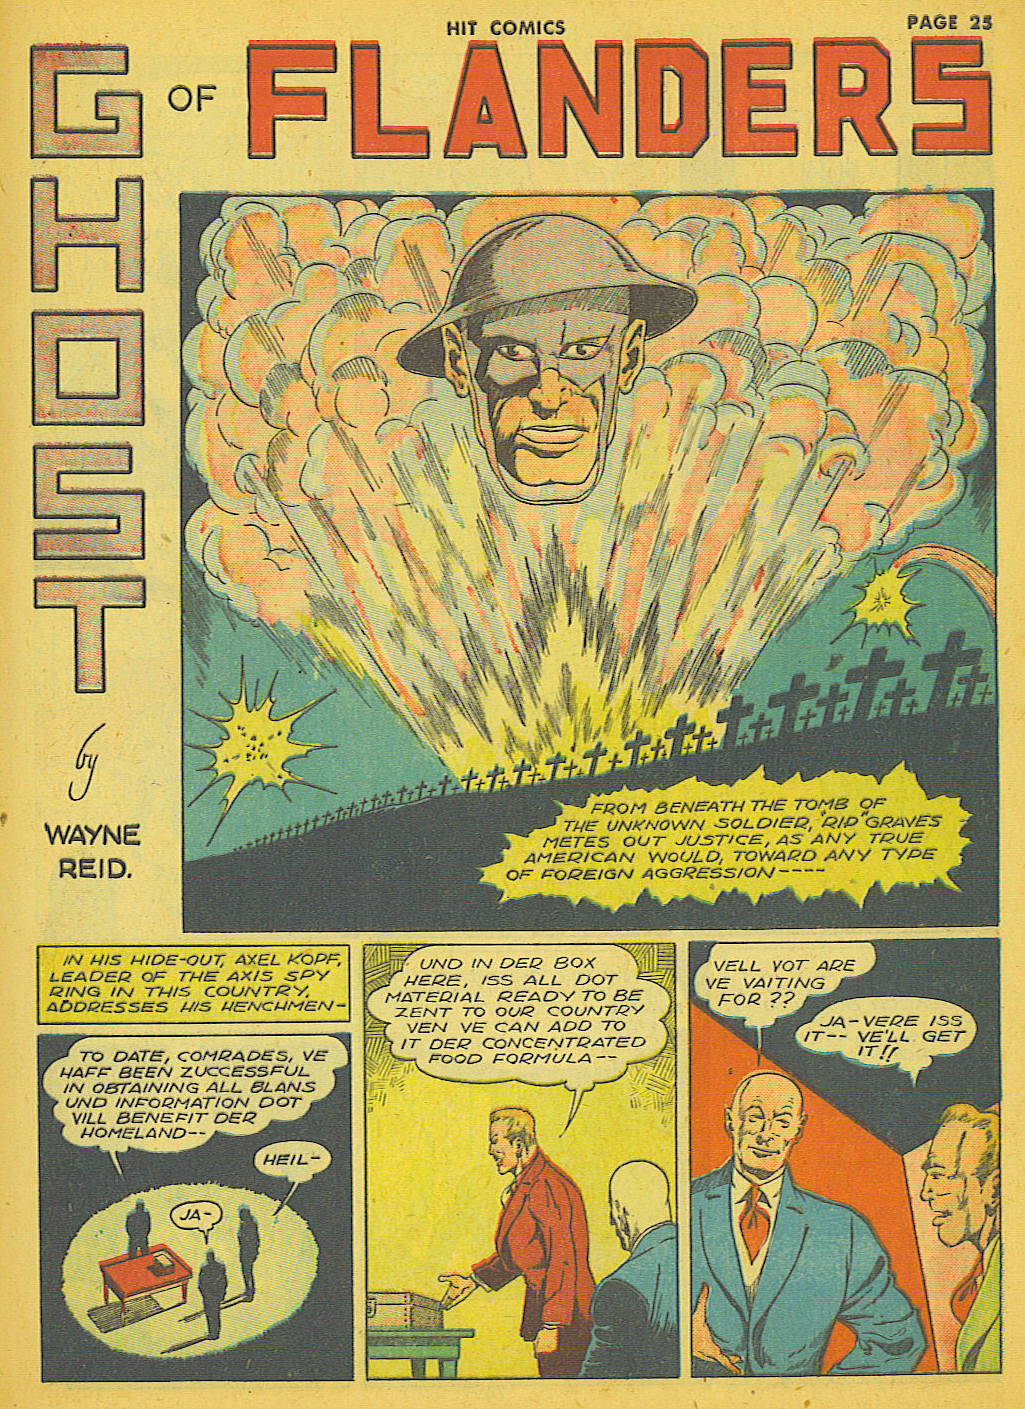 Read online Hit Comics comic -  Issue #21 - 27